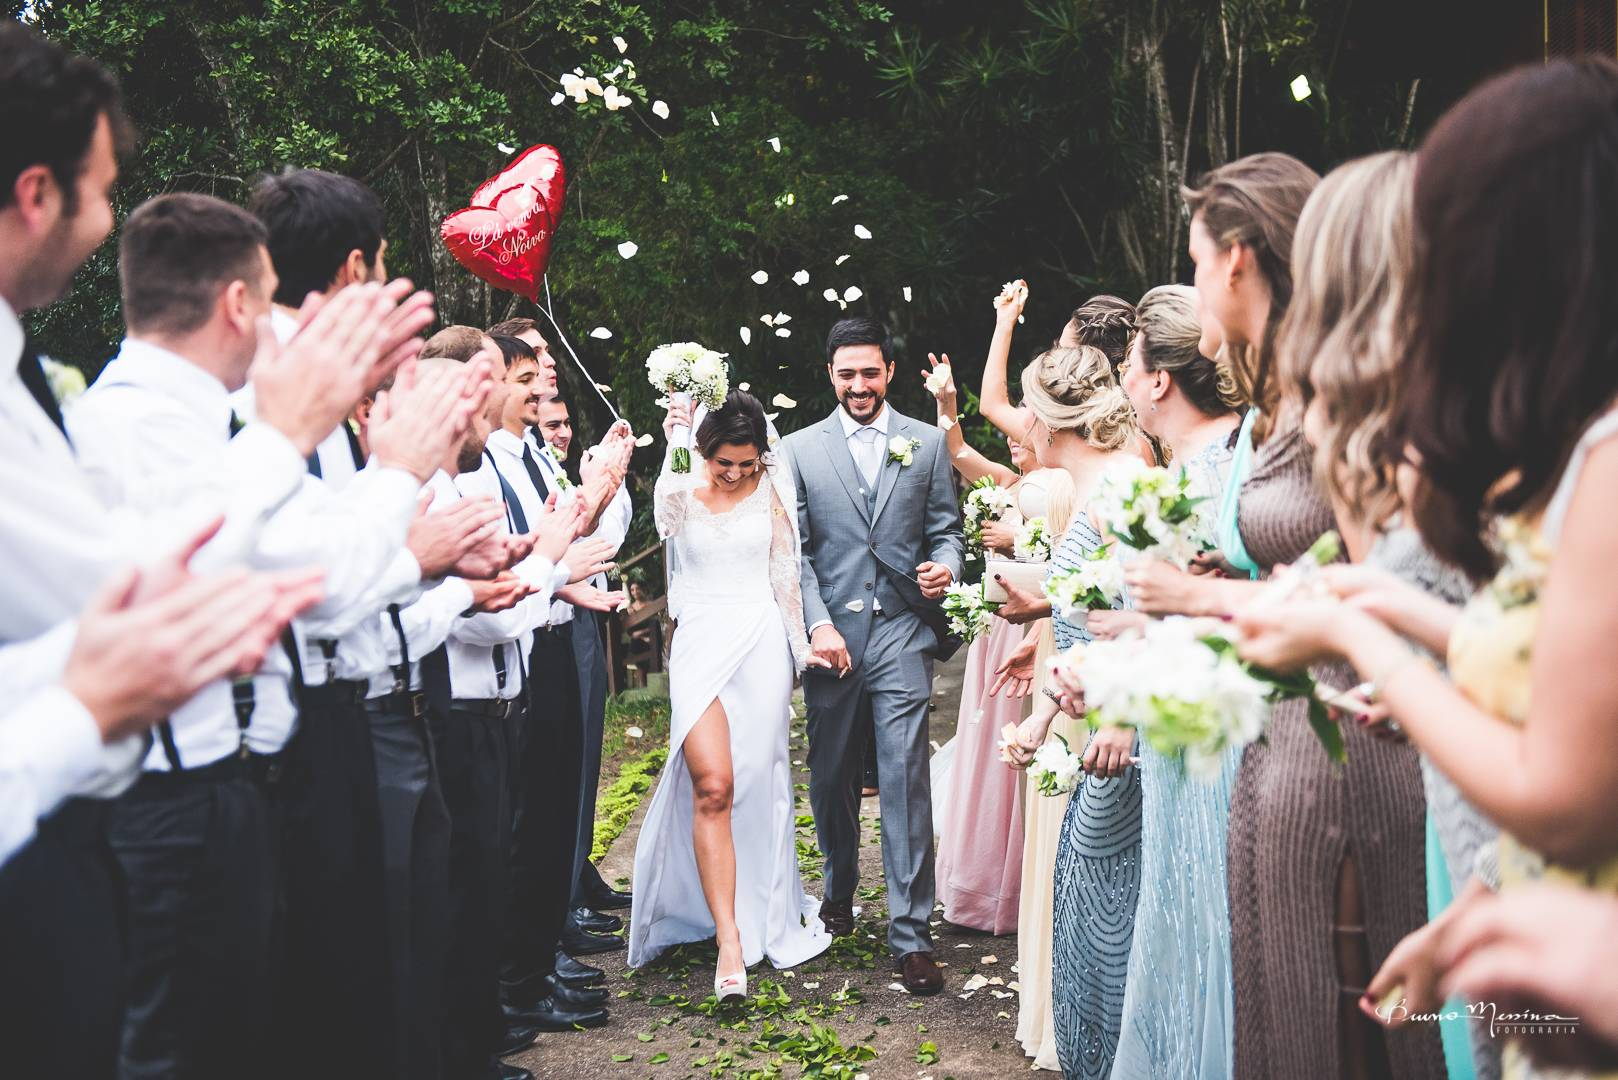 casamento-ao-ar-livre-casamento-na-praia-fotos-casamento-de-dia39-1